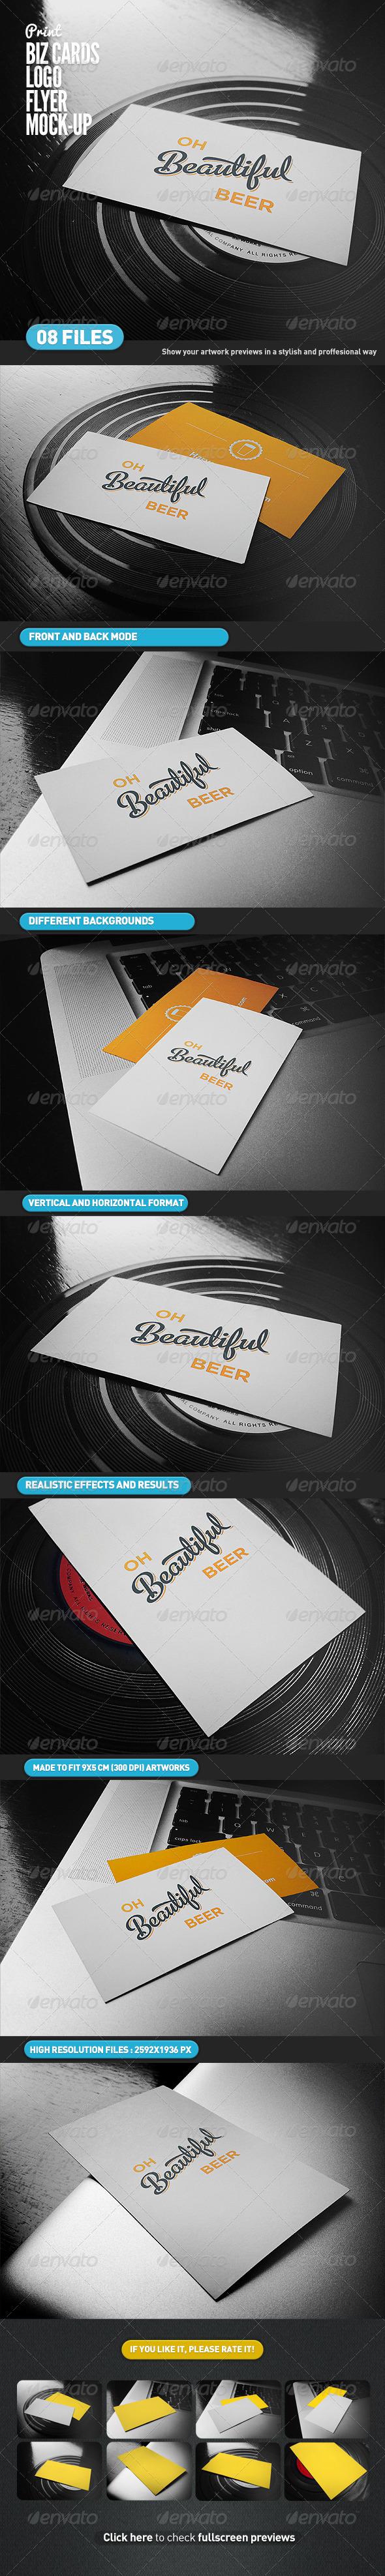 Business Cards Flyer Logo Mock Up by itscroma